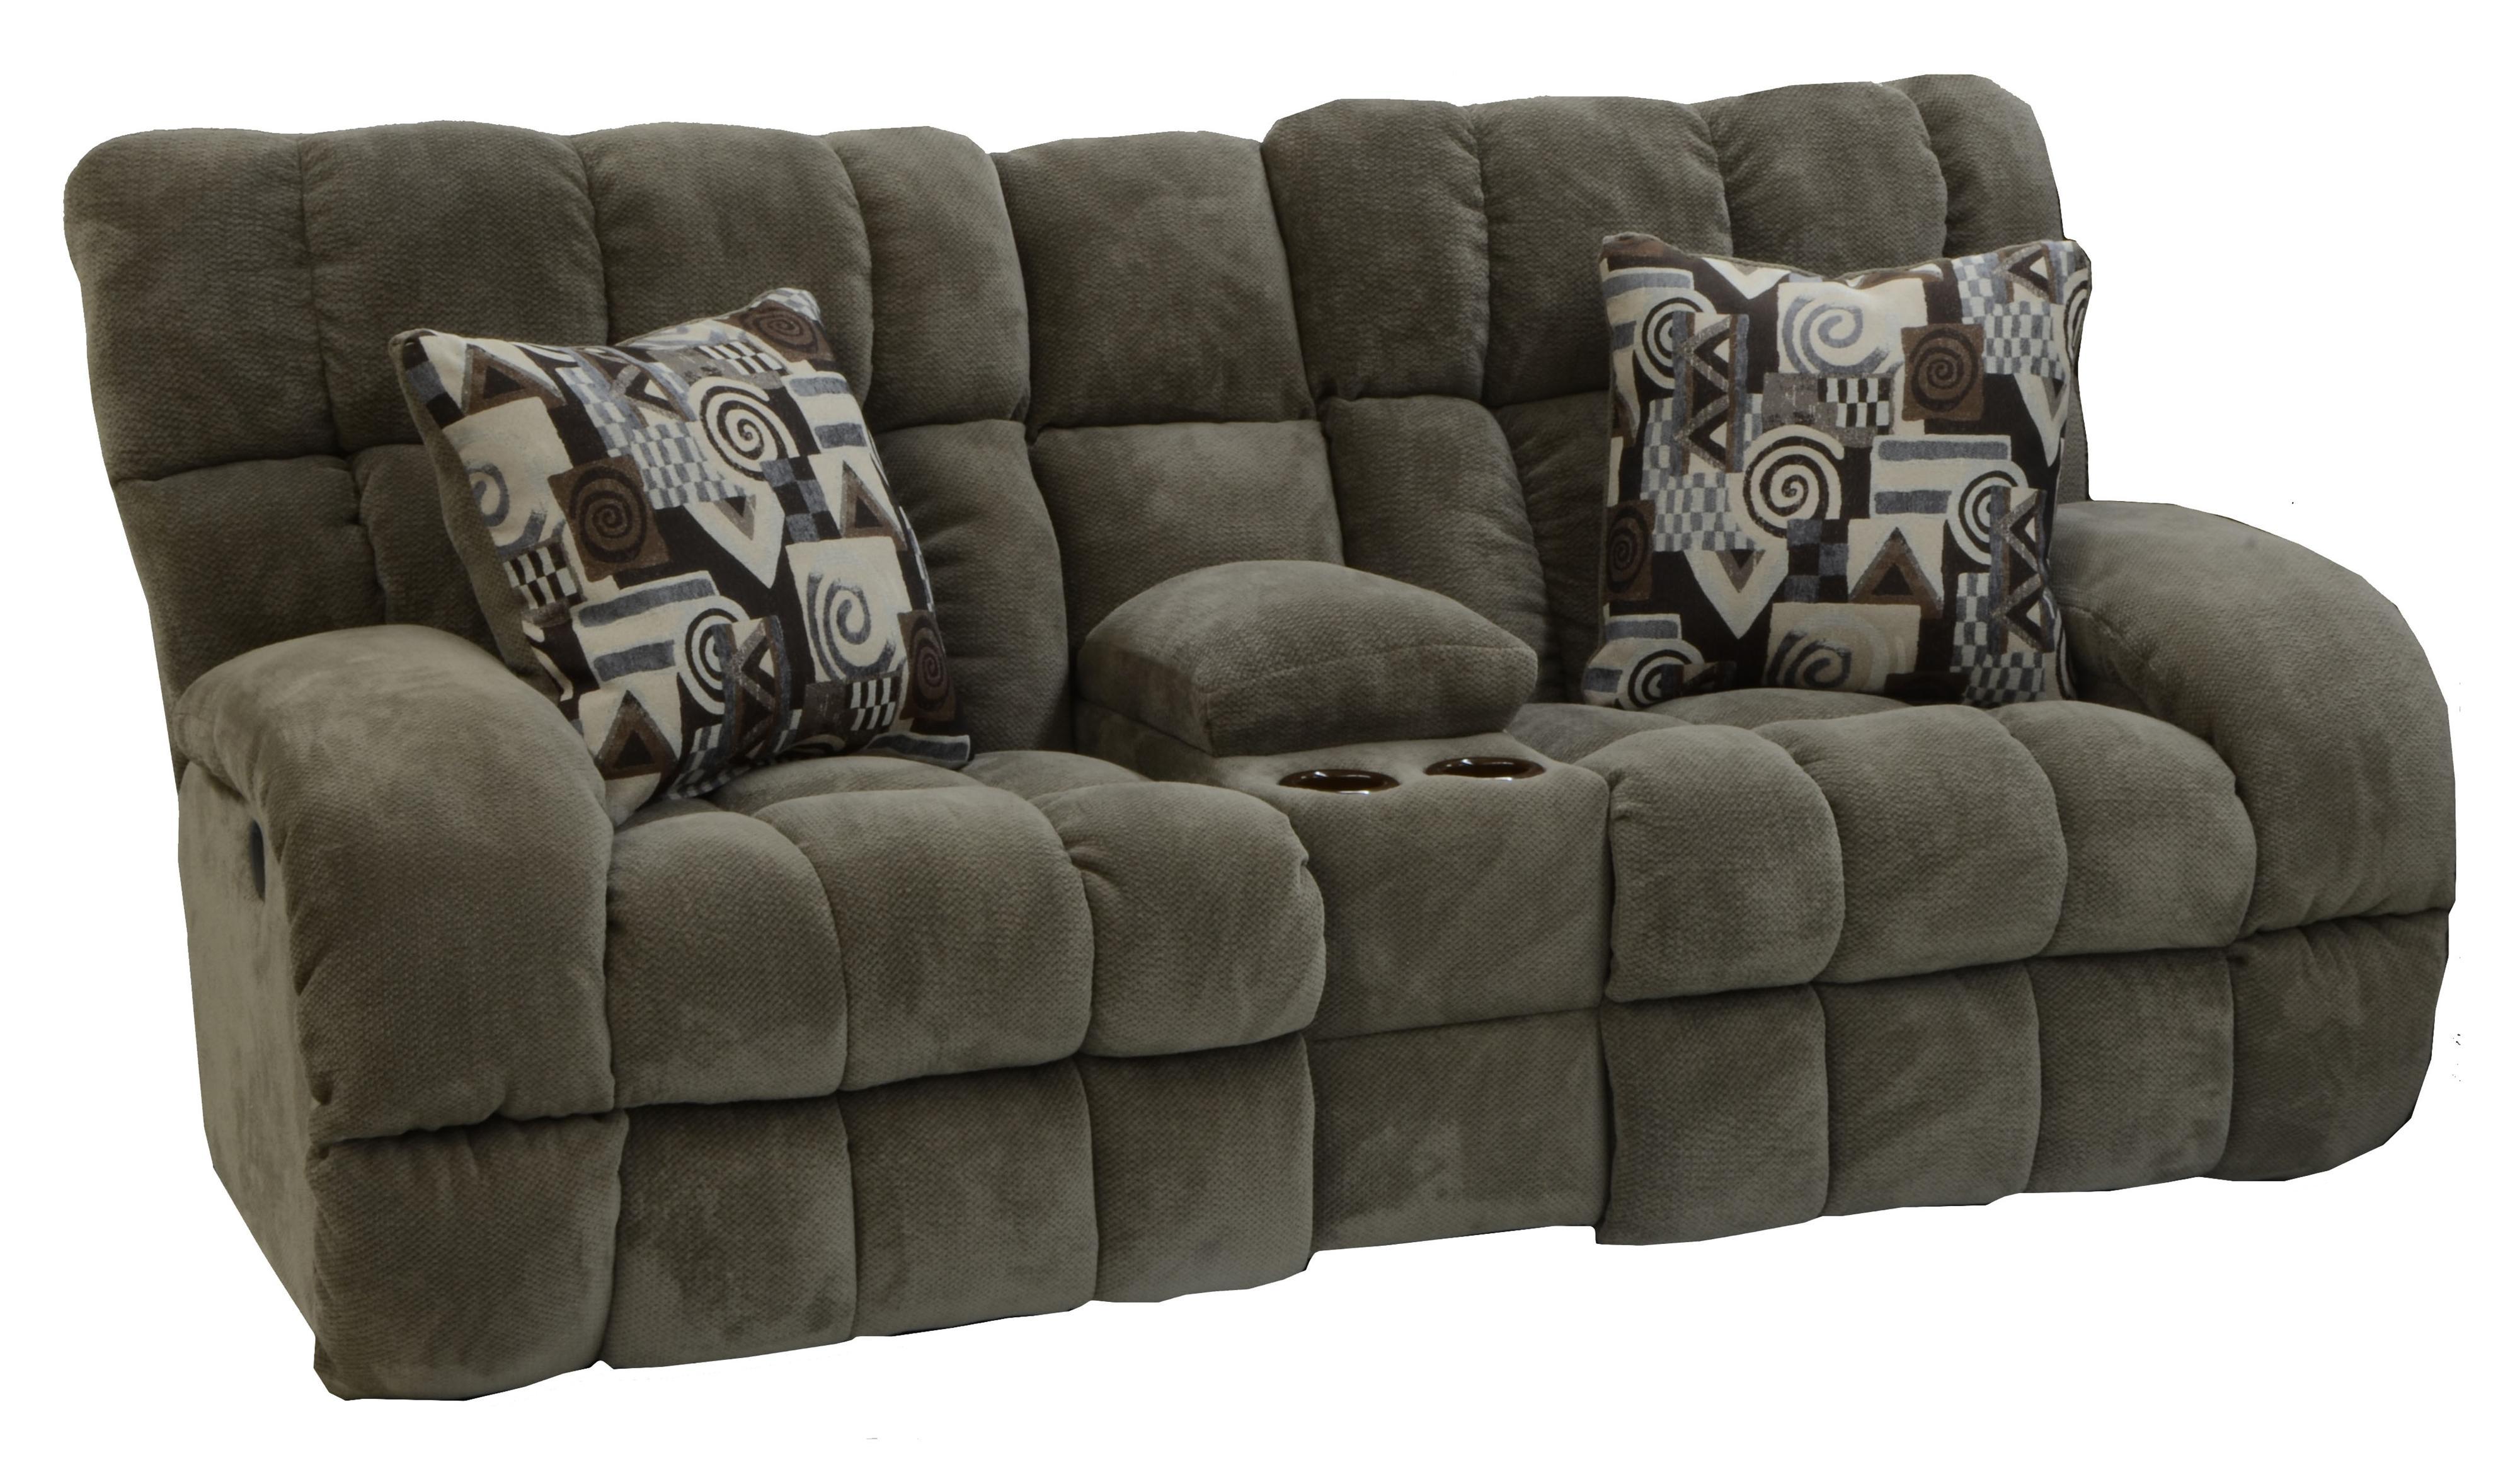 catnapper sofa narra set design philippines siesta power lay flat reclining console loveseat